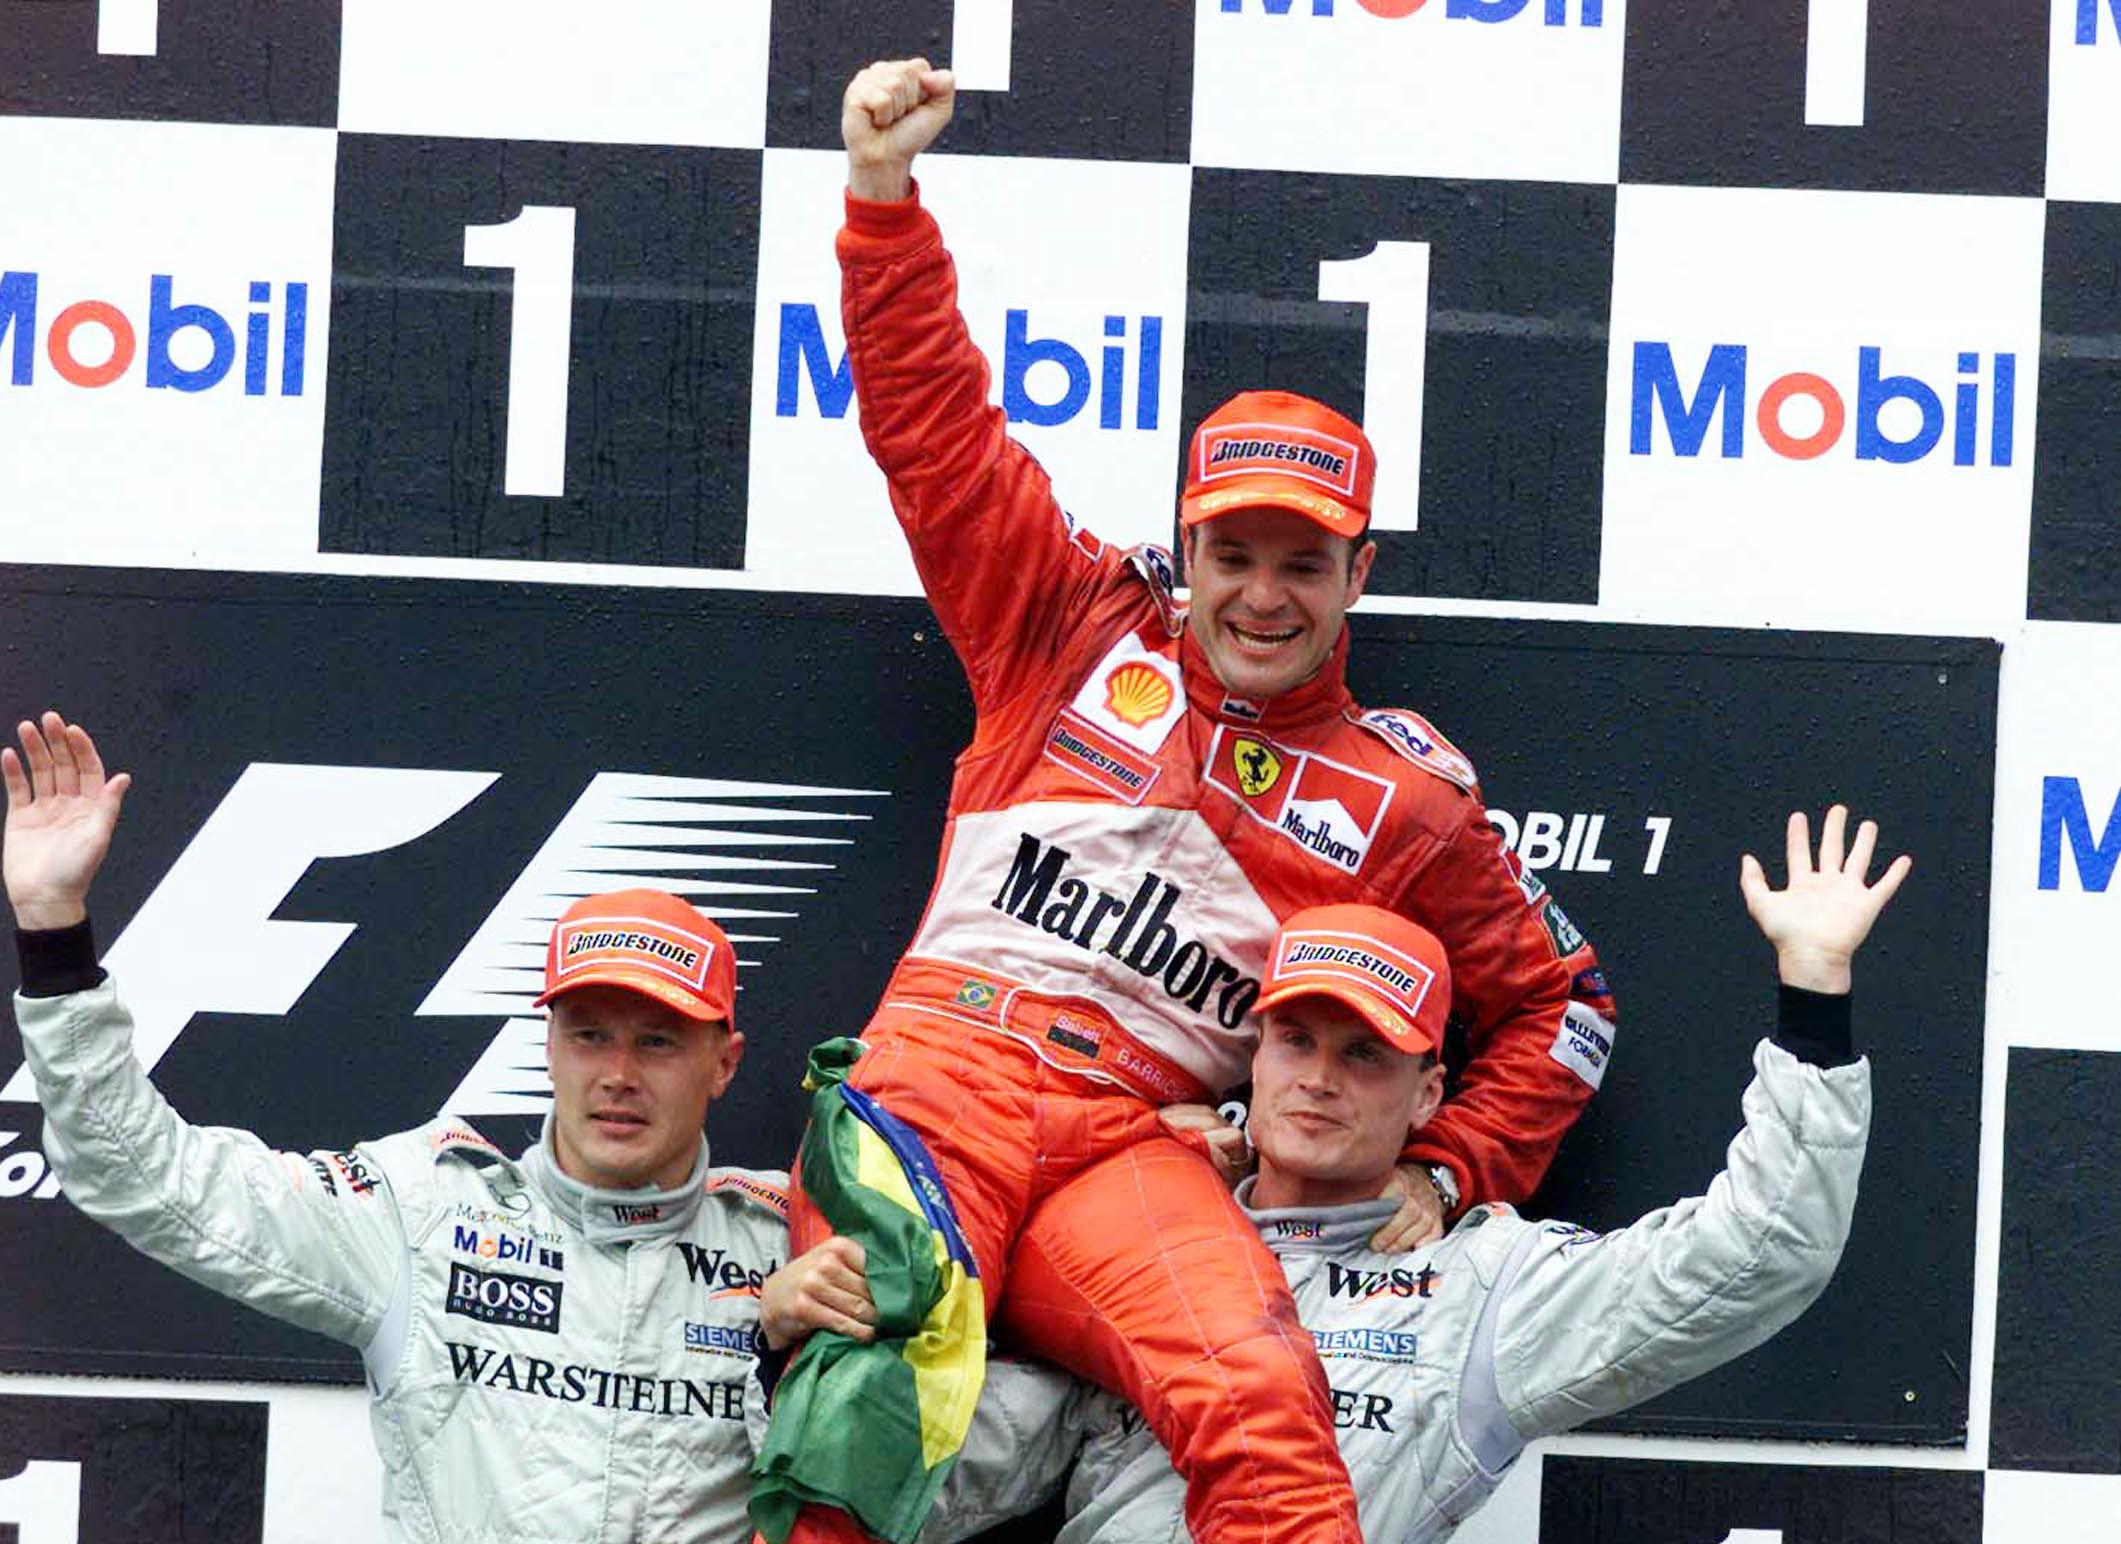 Rubens Barrichello wins German Grand Prix 2000